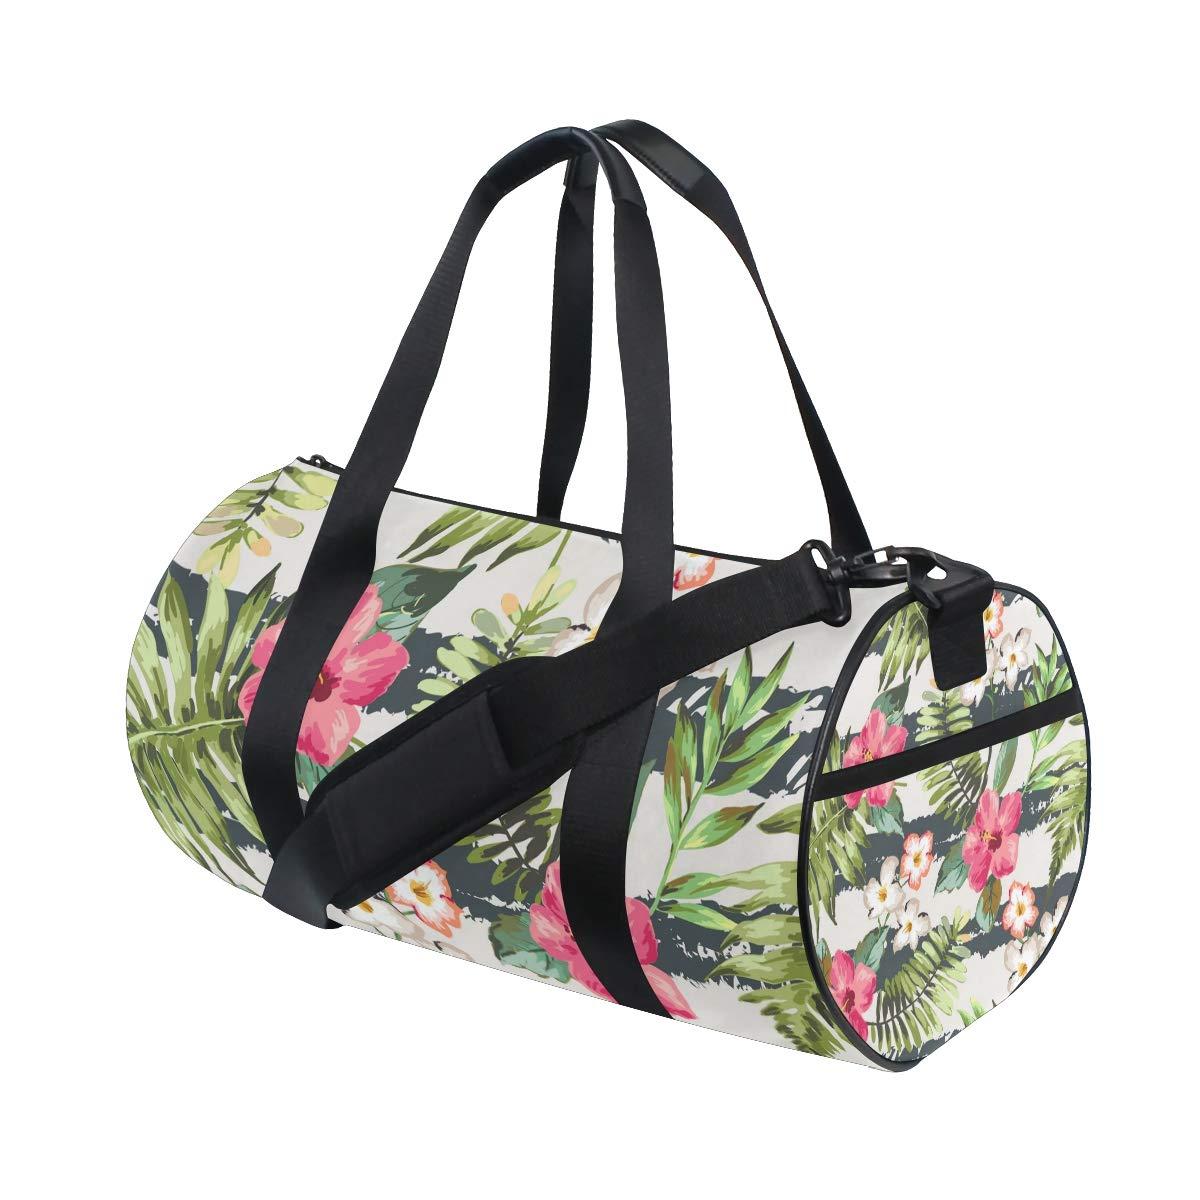 Tropical Plant Sports Gym Bag Travel Duffel Bag with Pockets Luggage & Travel Gear Shoulder Strap Fitness Bag